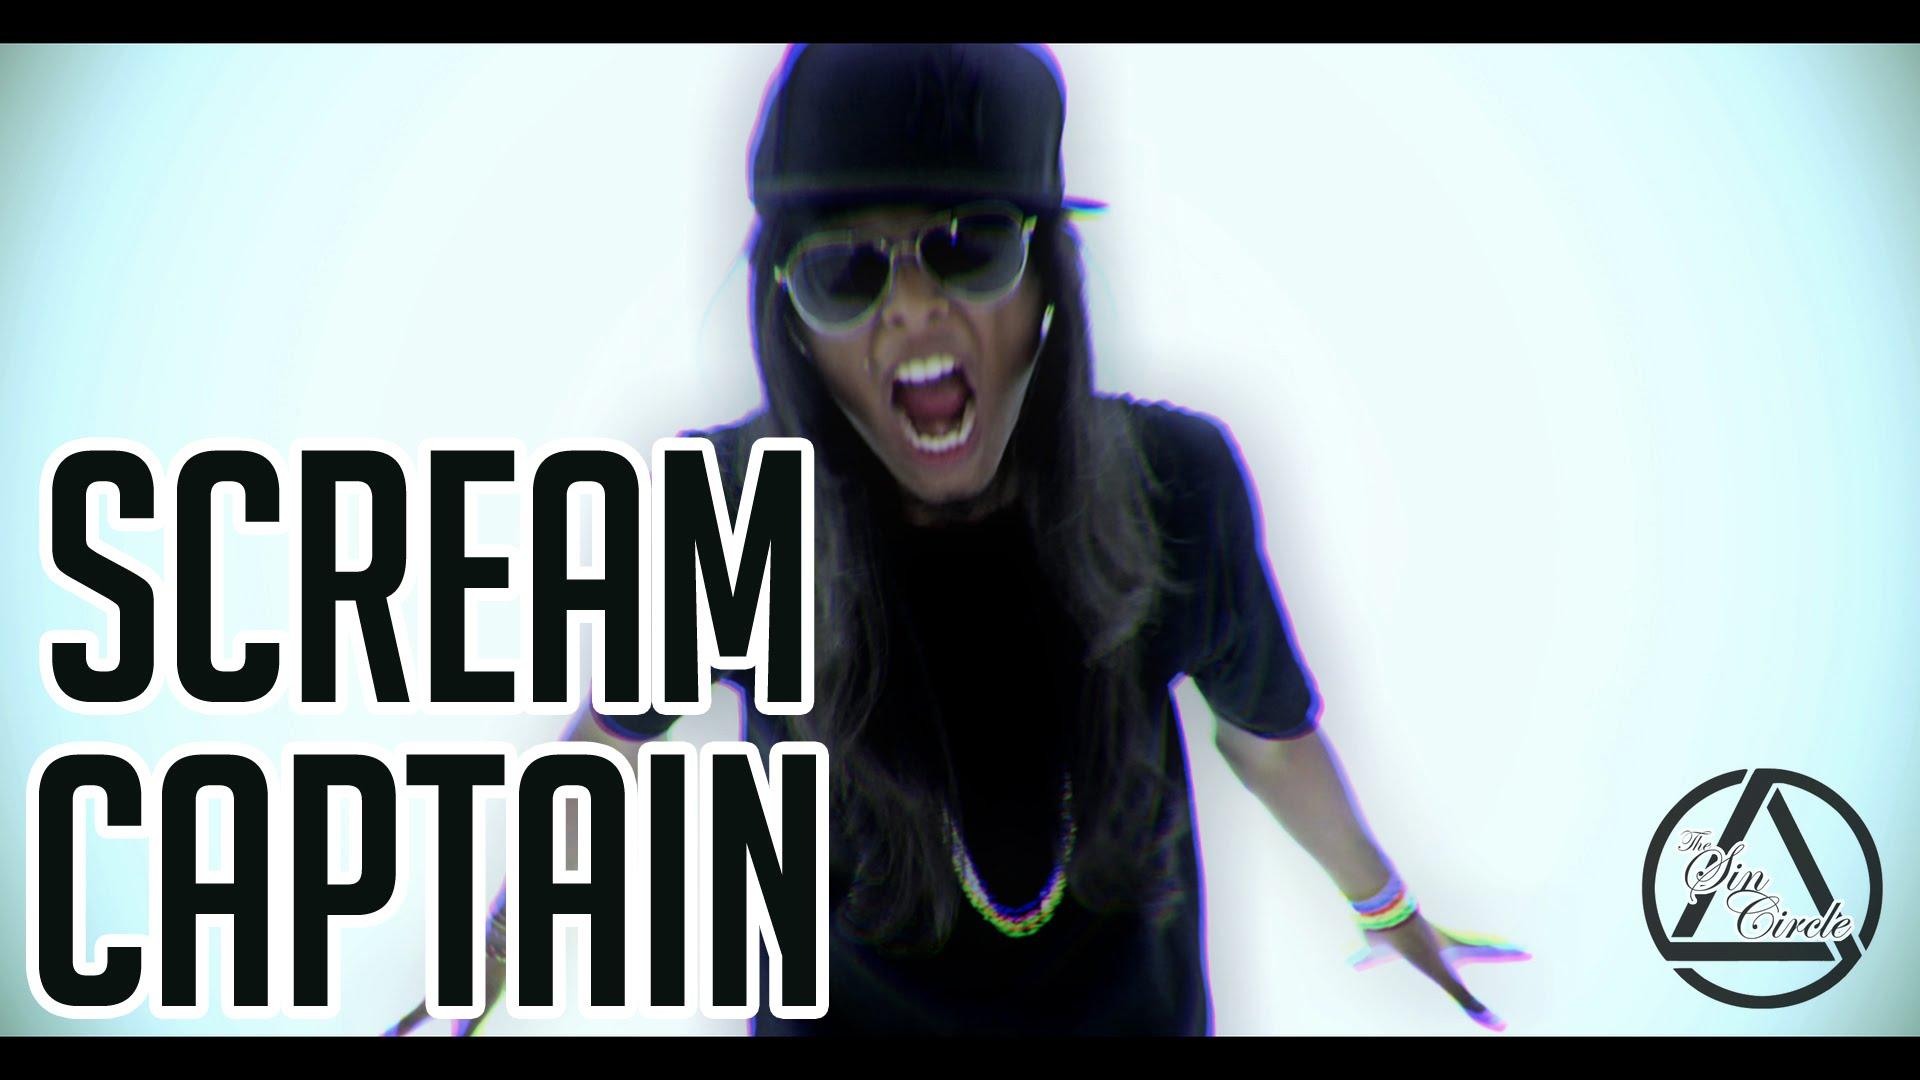 Etienne Sin - Scream Captain (Heavy Trap Music)